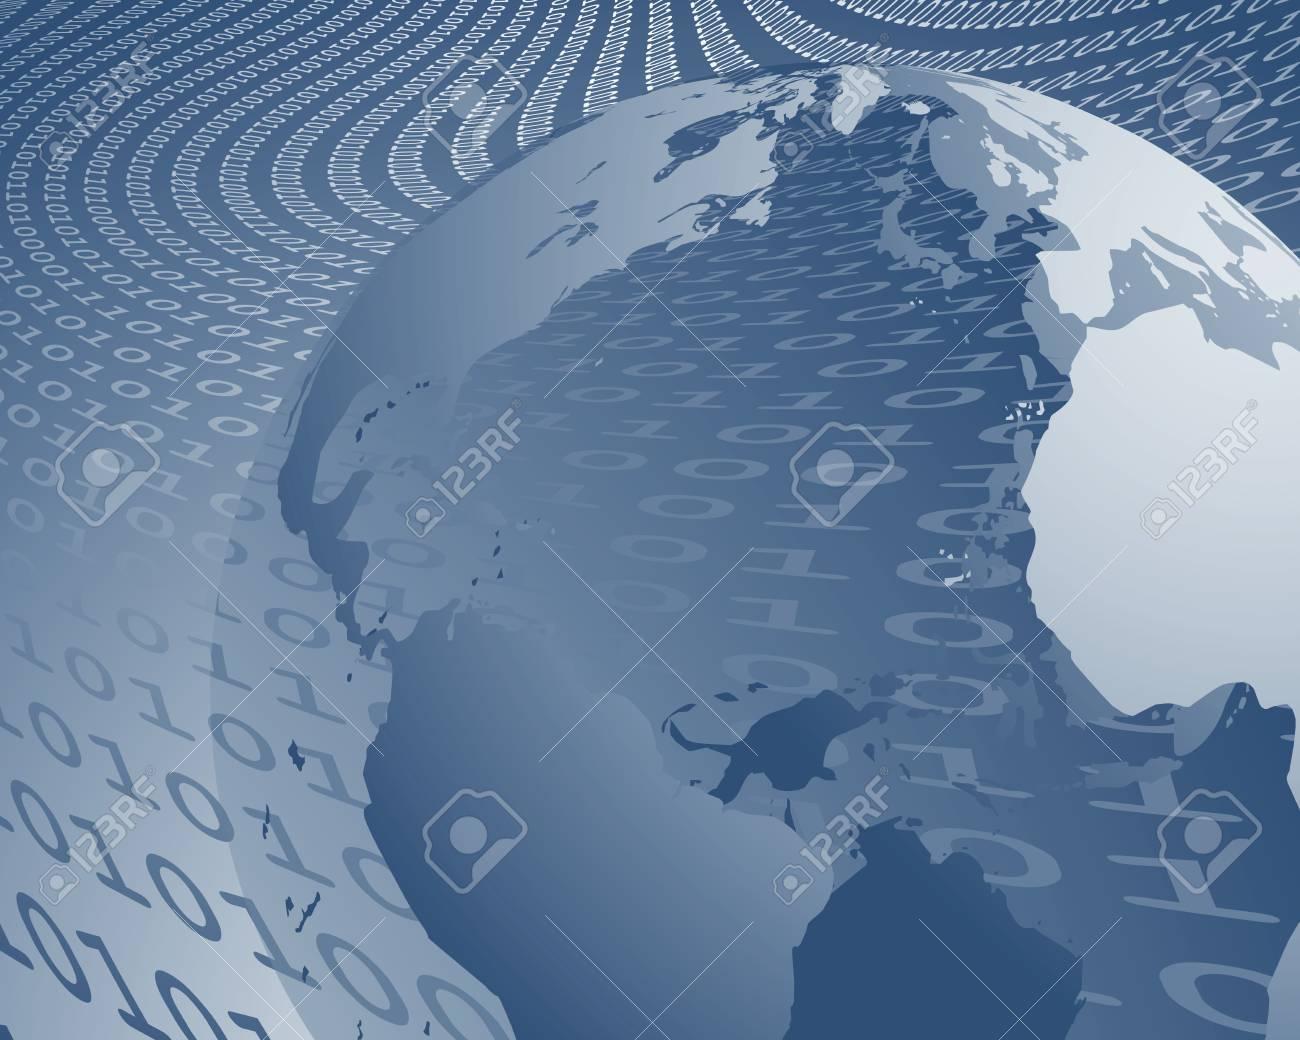 world wide data transfer Stock Vector - 5205741